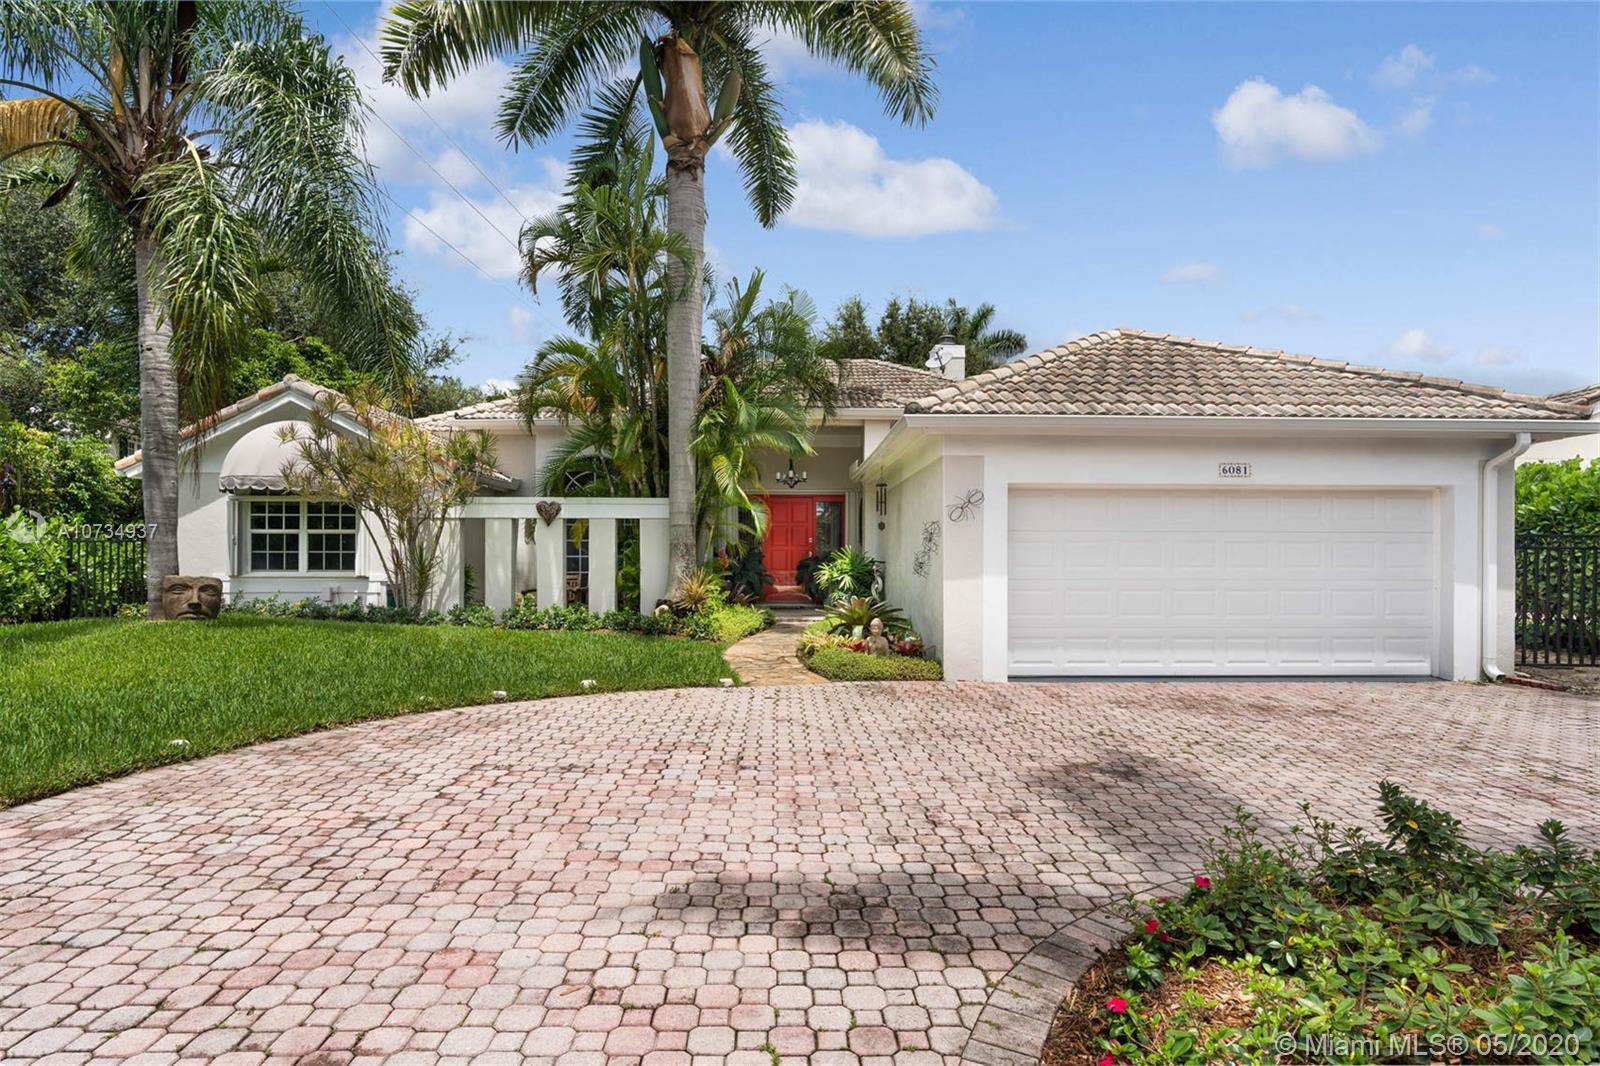 6081 SW 88th St, South Miami, FL 33156